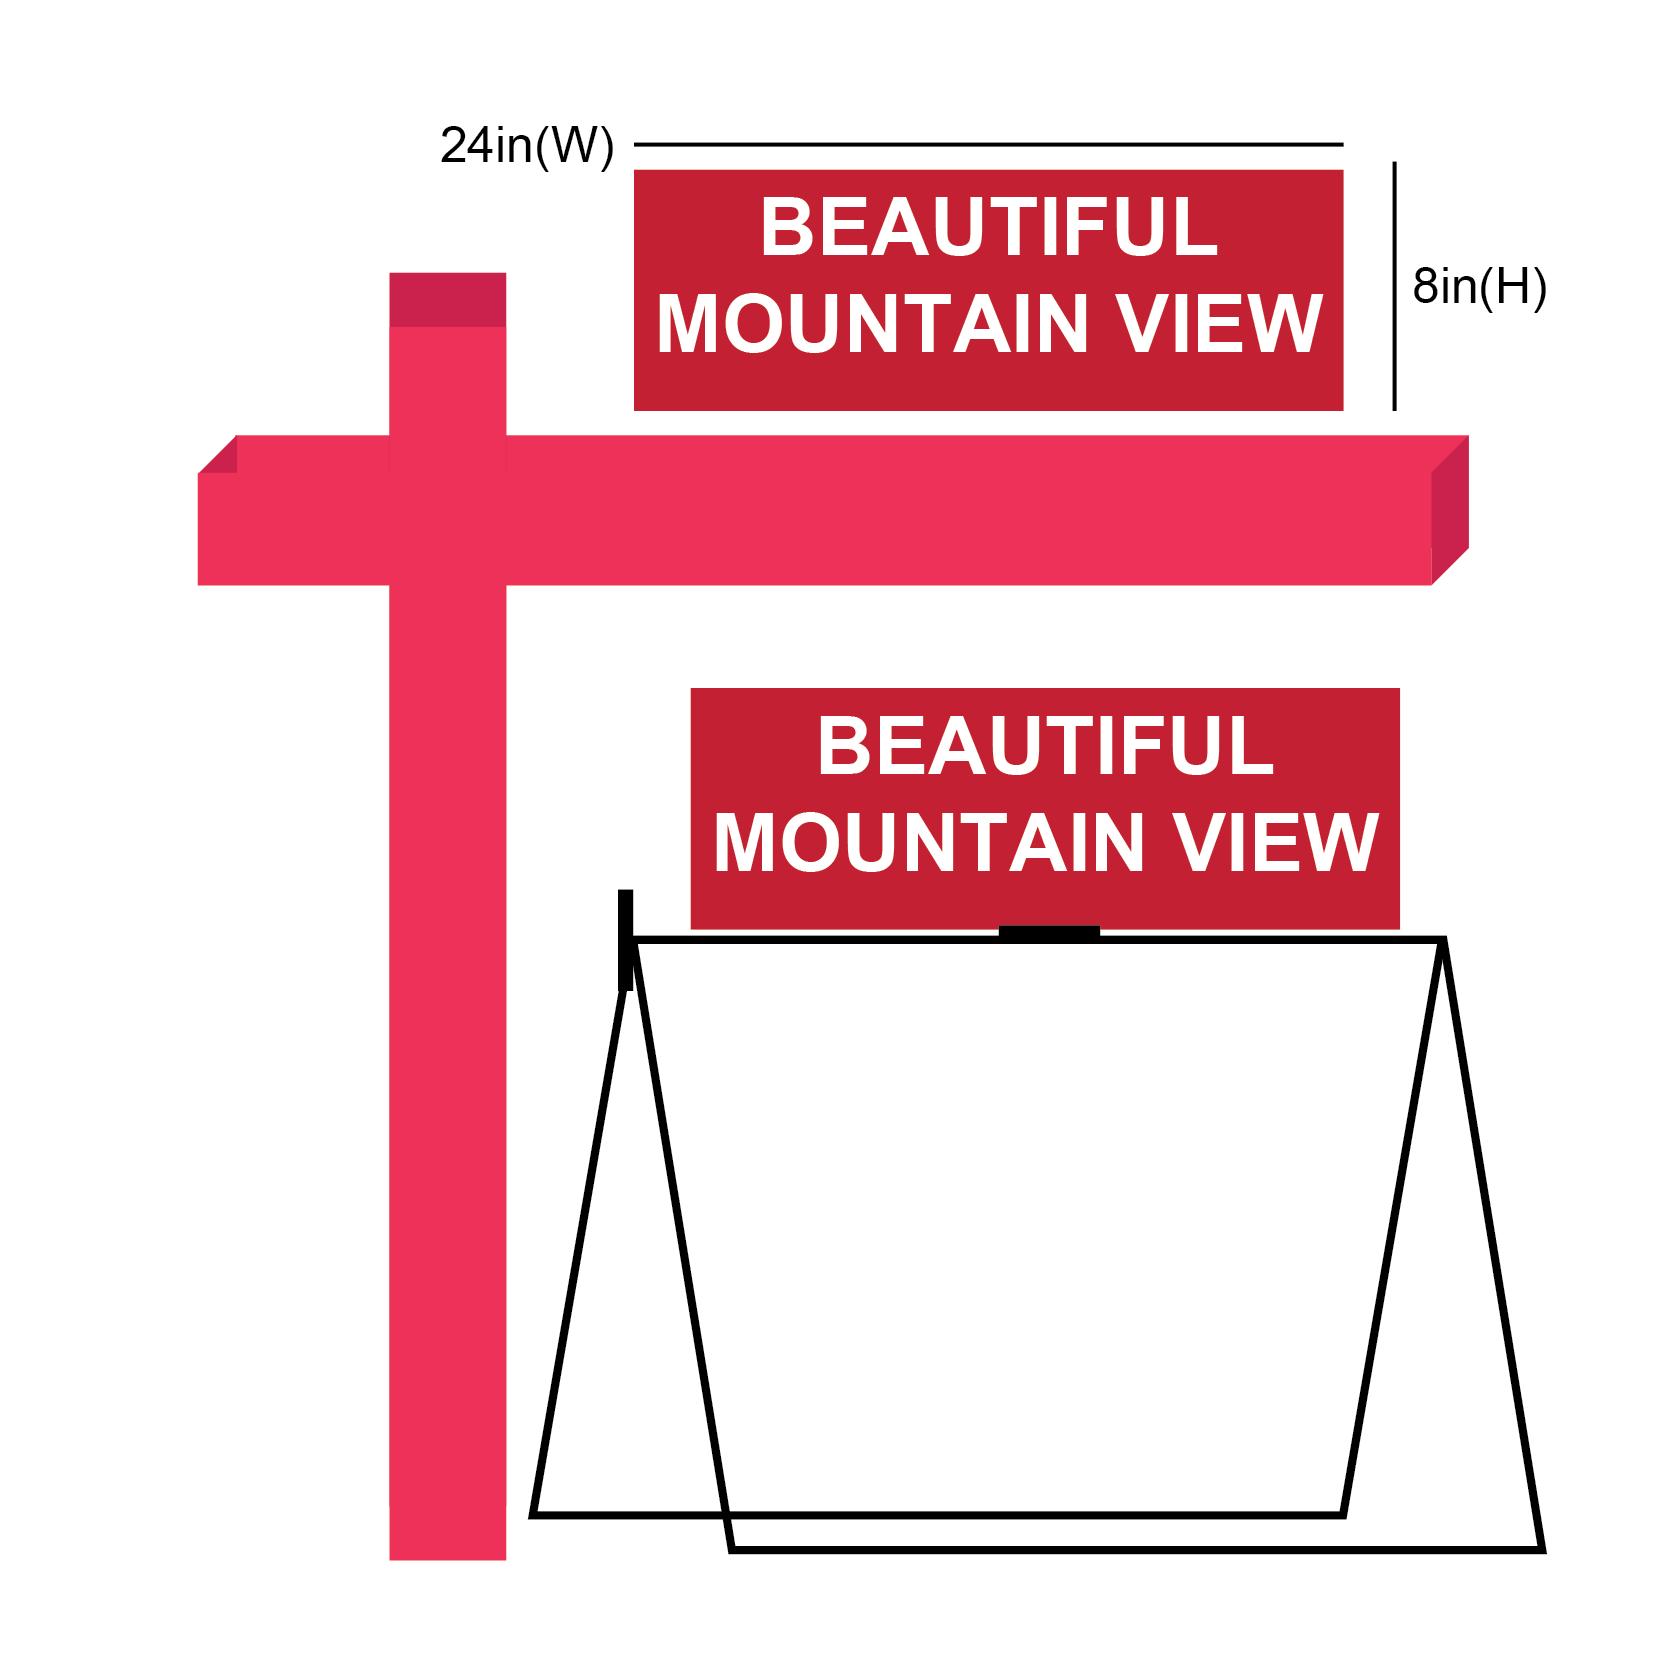 beautiful mountain view Rider